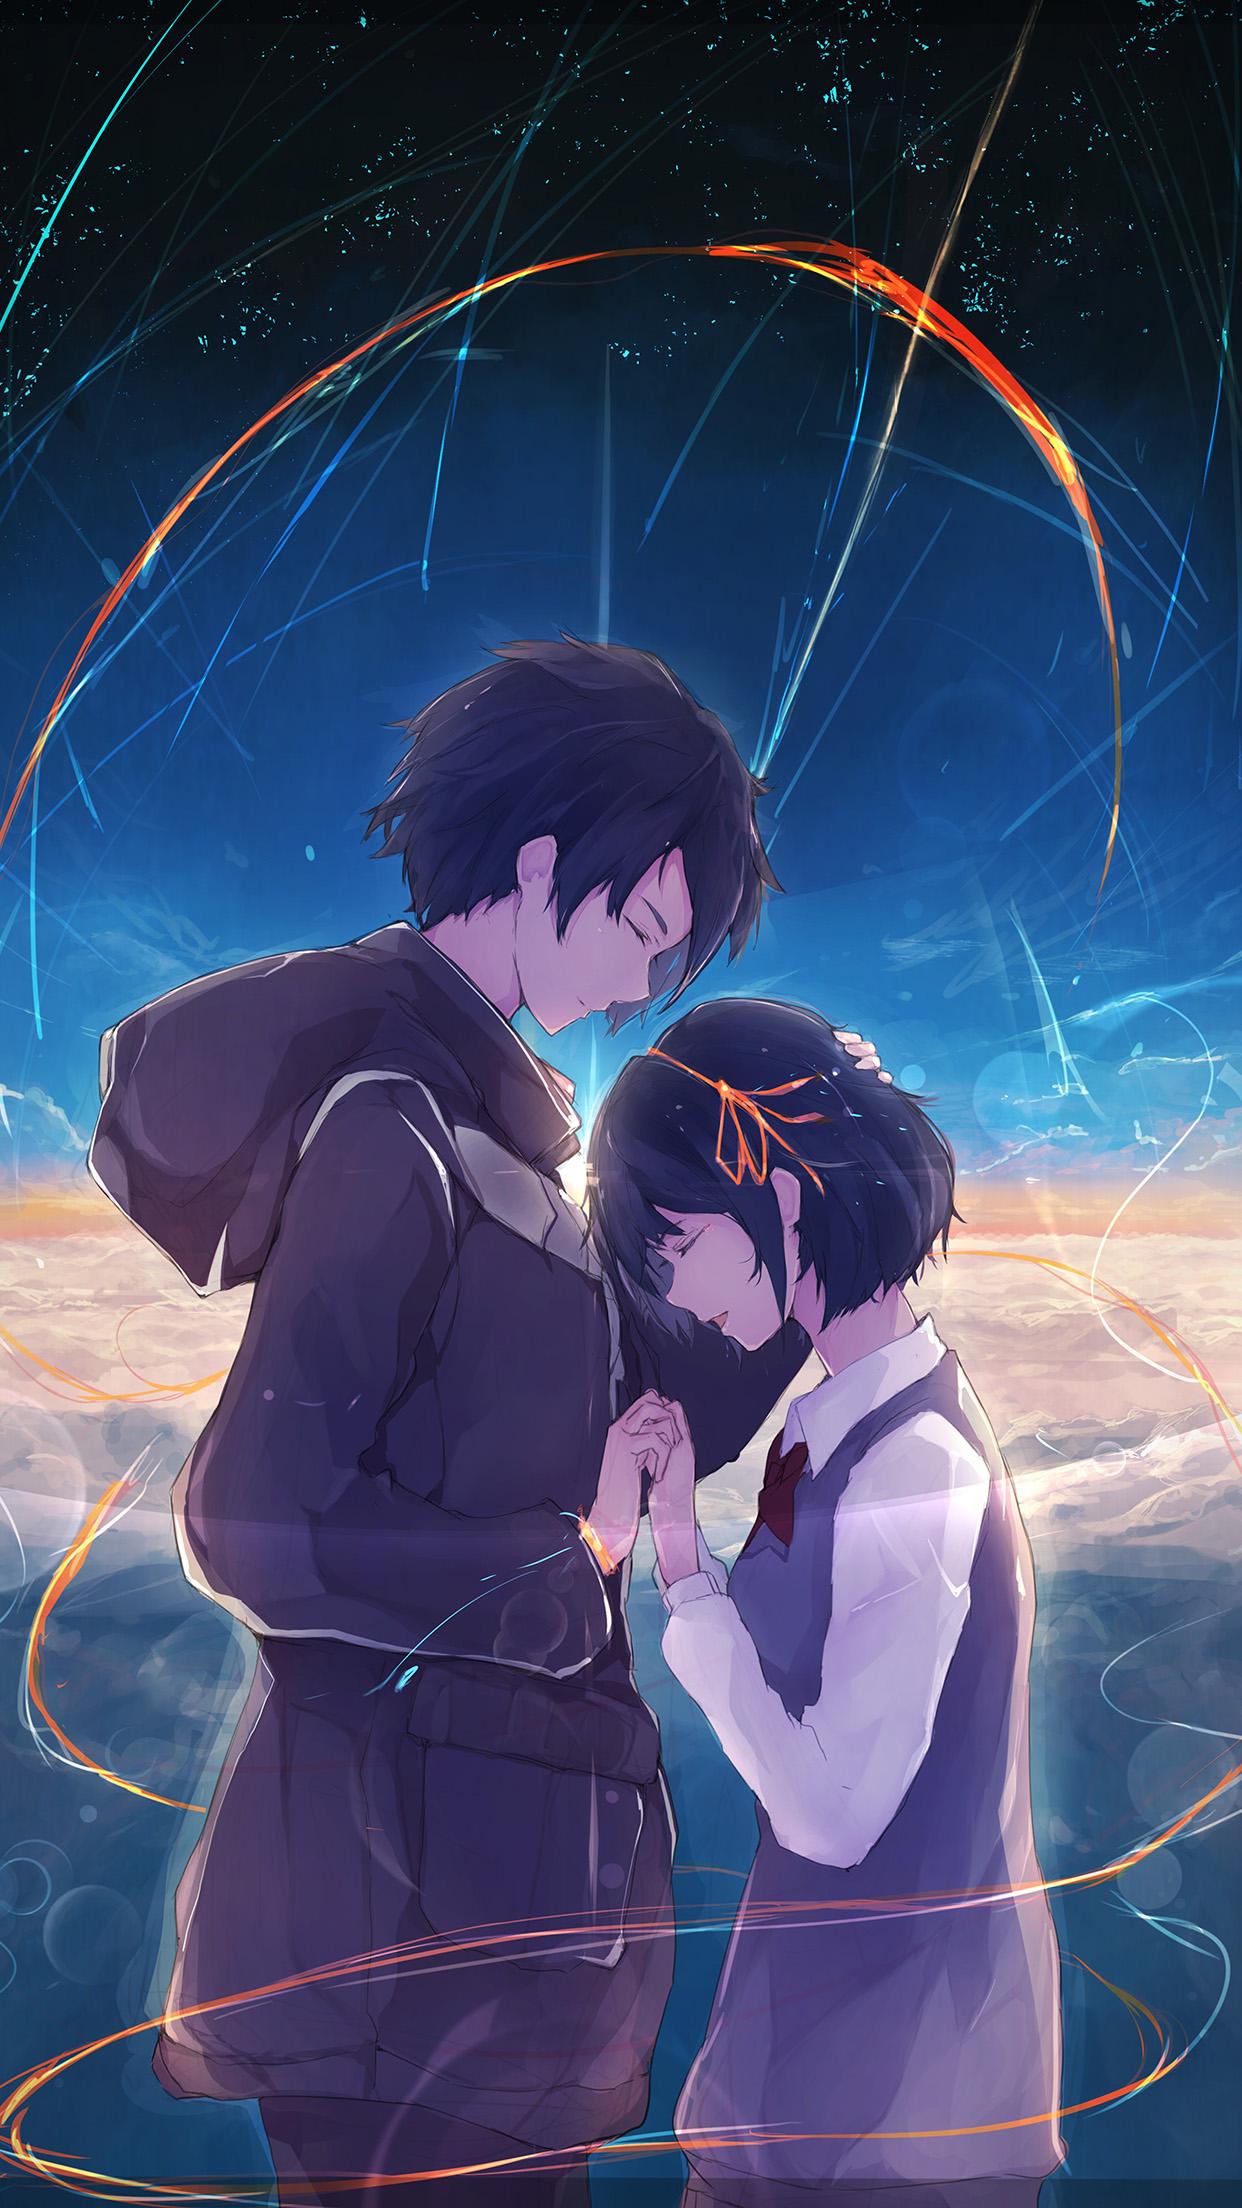 Cute Love Couples Wallpapers For Mobile At27 Anime Kiminonawa Drawing Art Illustration Wallpaper